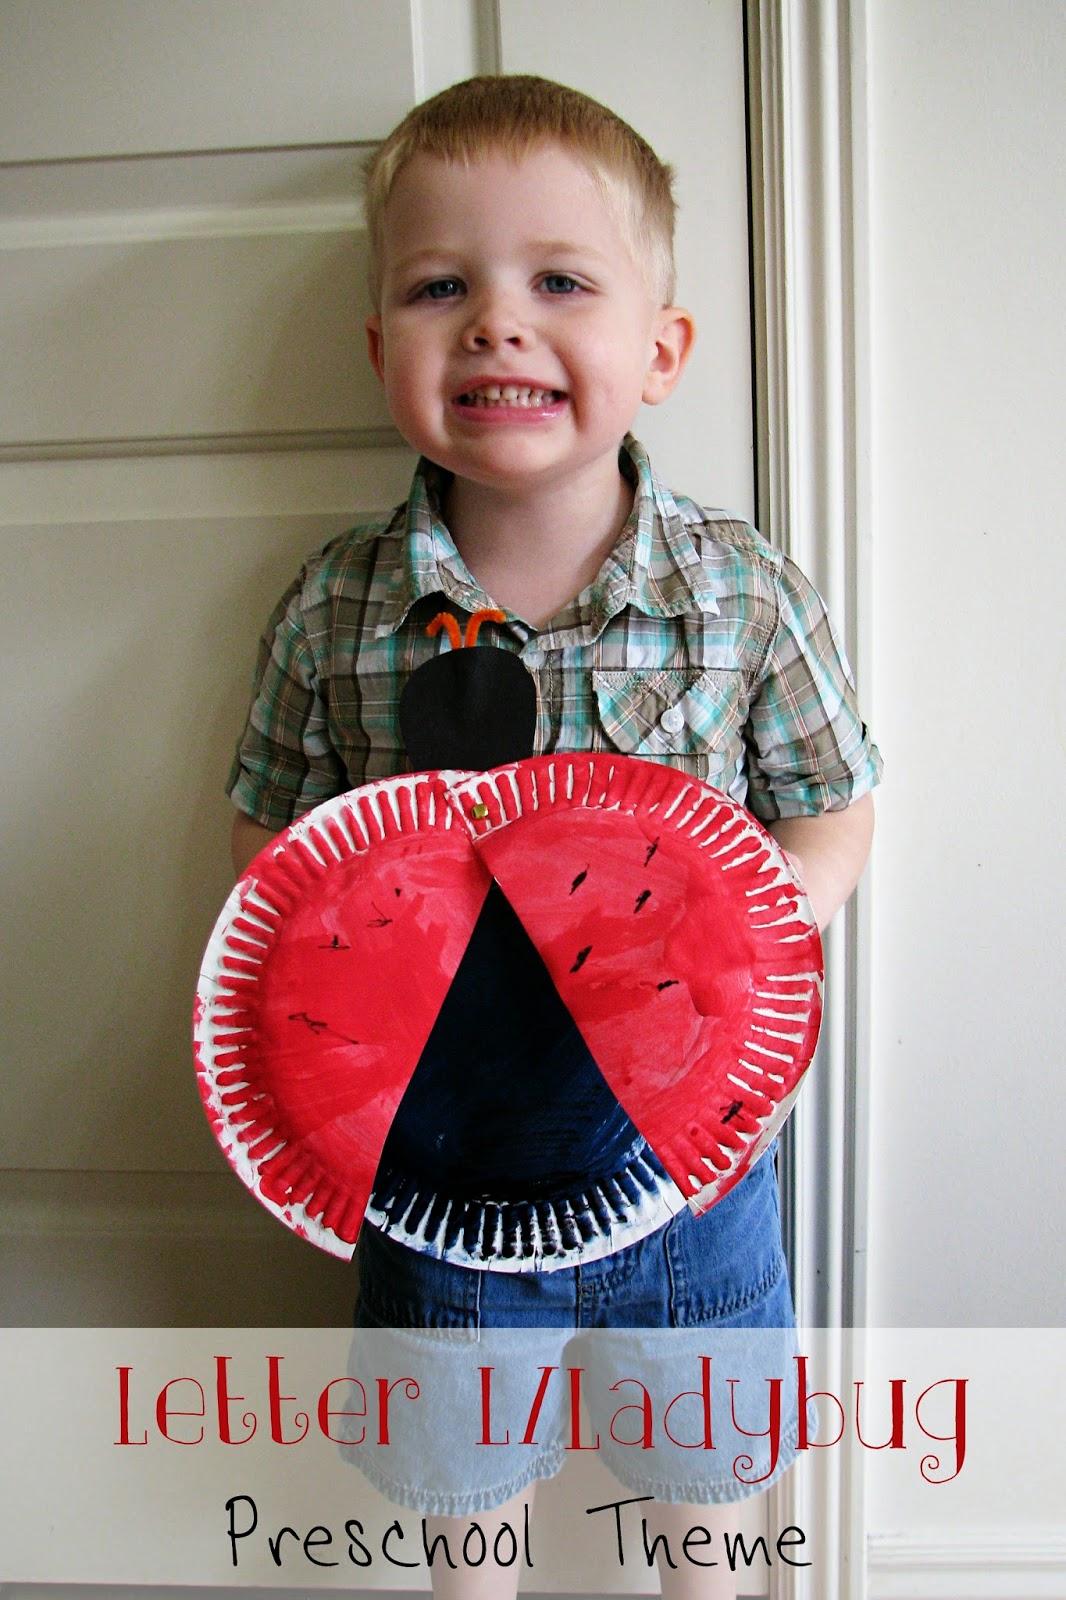 mommy u0026 39 s little helper  letter l  ladybug preschool theme